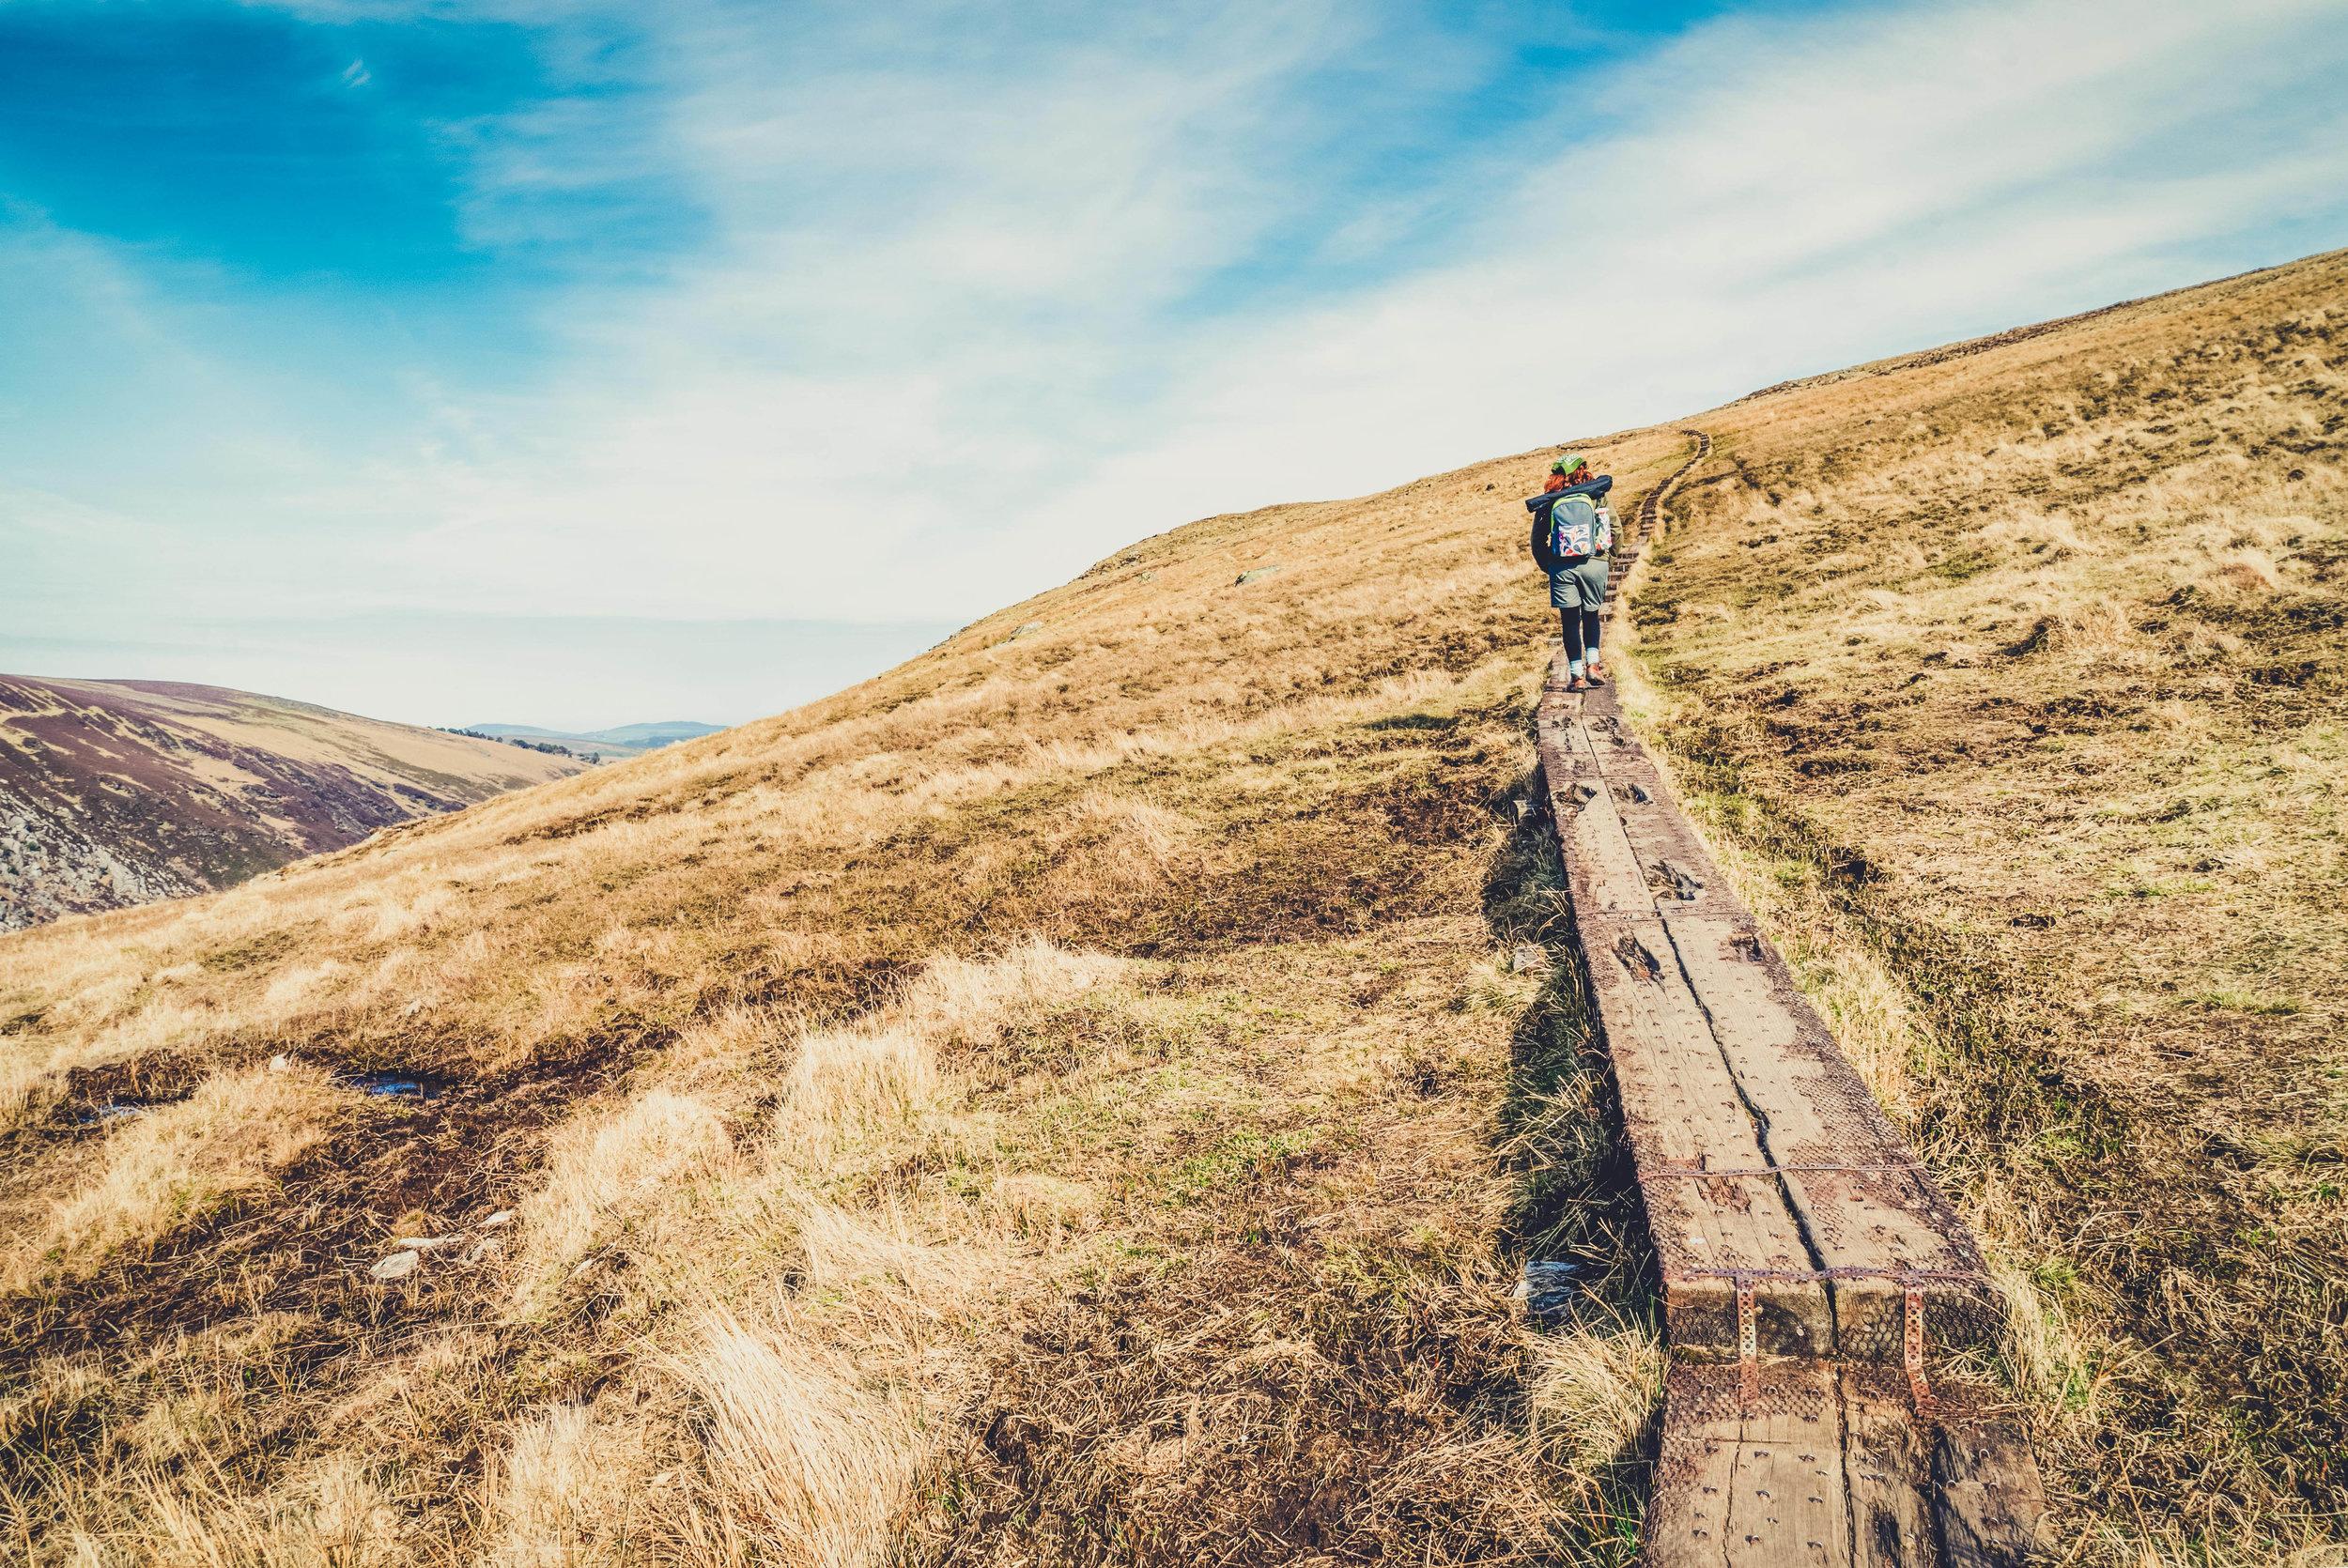 glendalough. irish history. county wicklow. round tower. hill walknig. hiking. grave yard. wildlife. tombstones. lakes. blue sky. following the trail.jpg